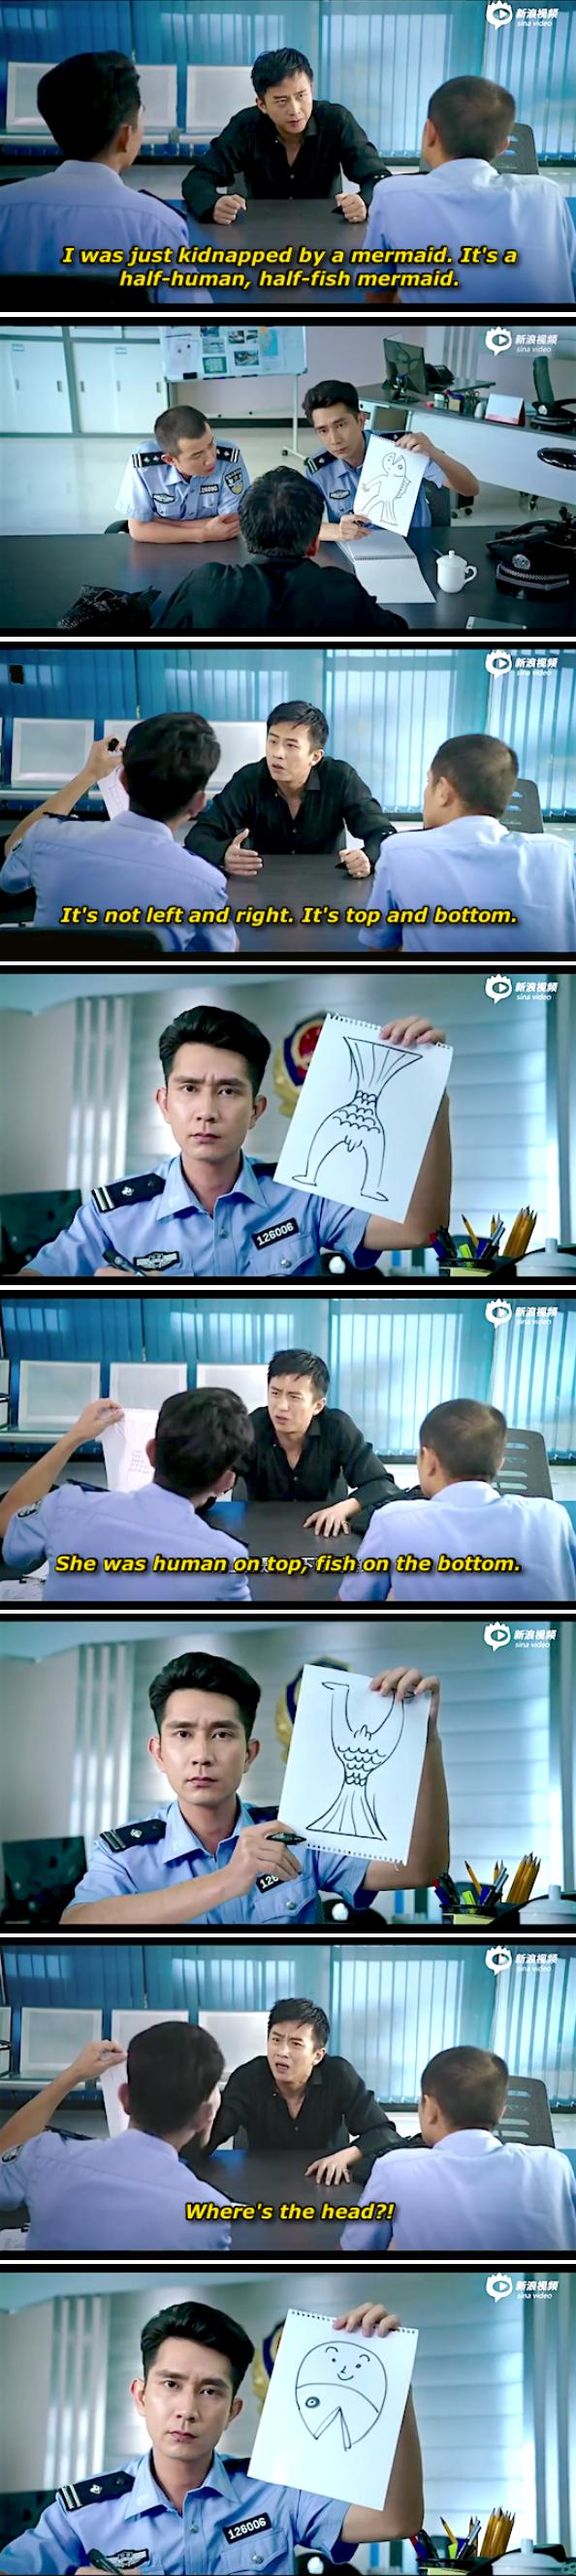 DVD CHINESE HONG KONG MOVIE The Mermaid 美人鱼 Stephen Chow